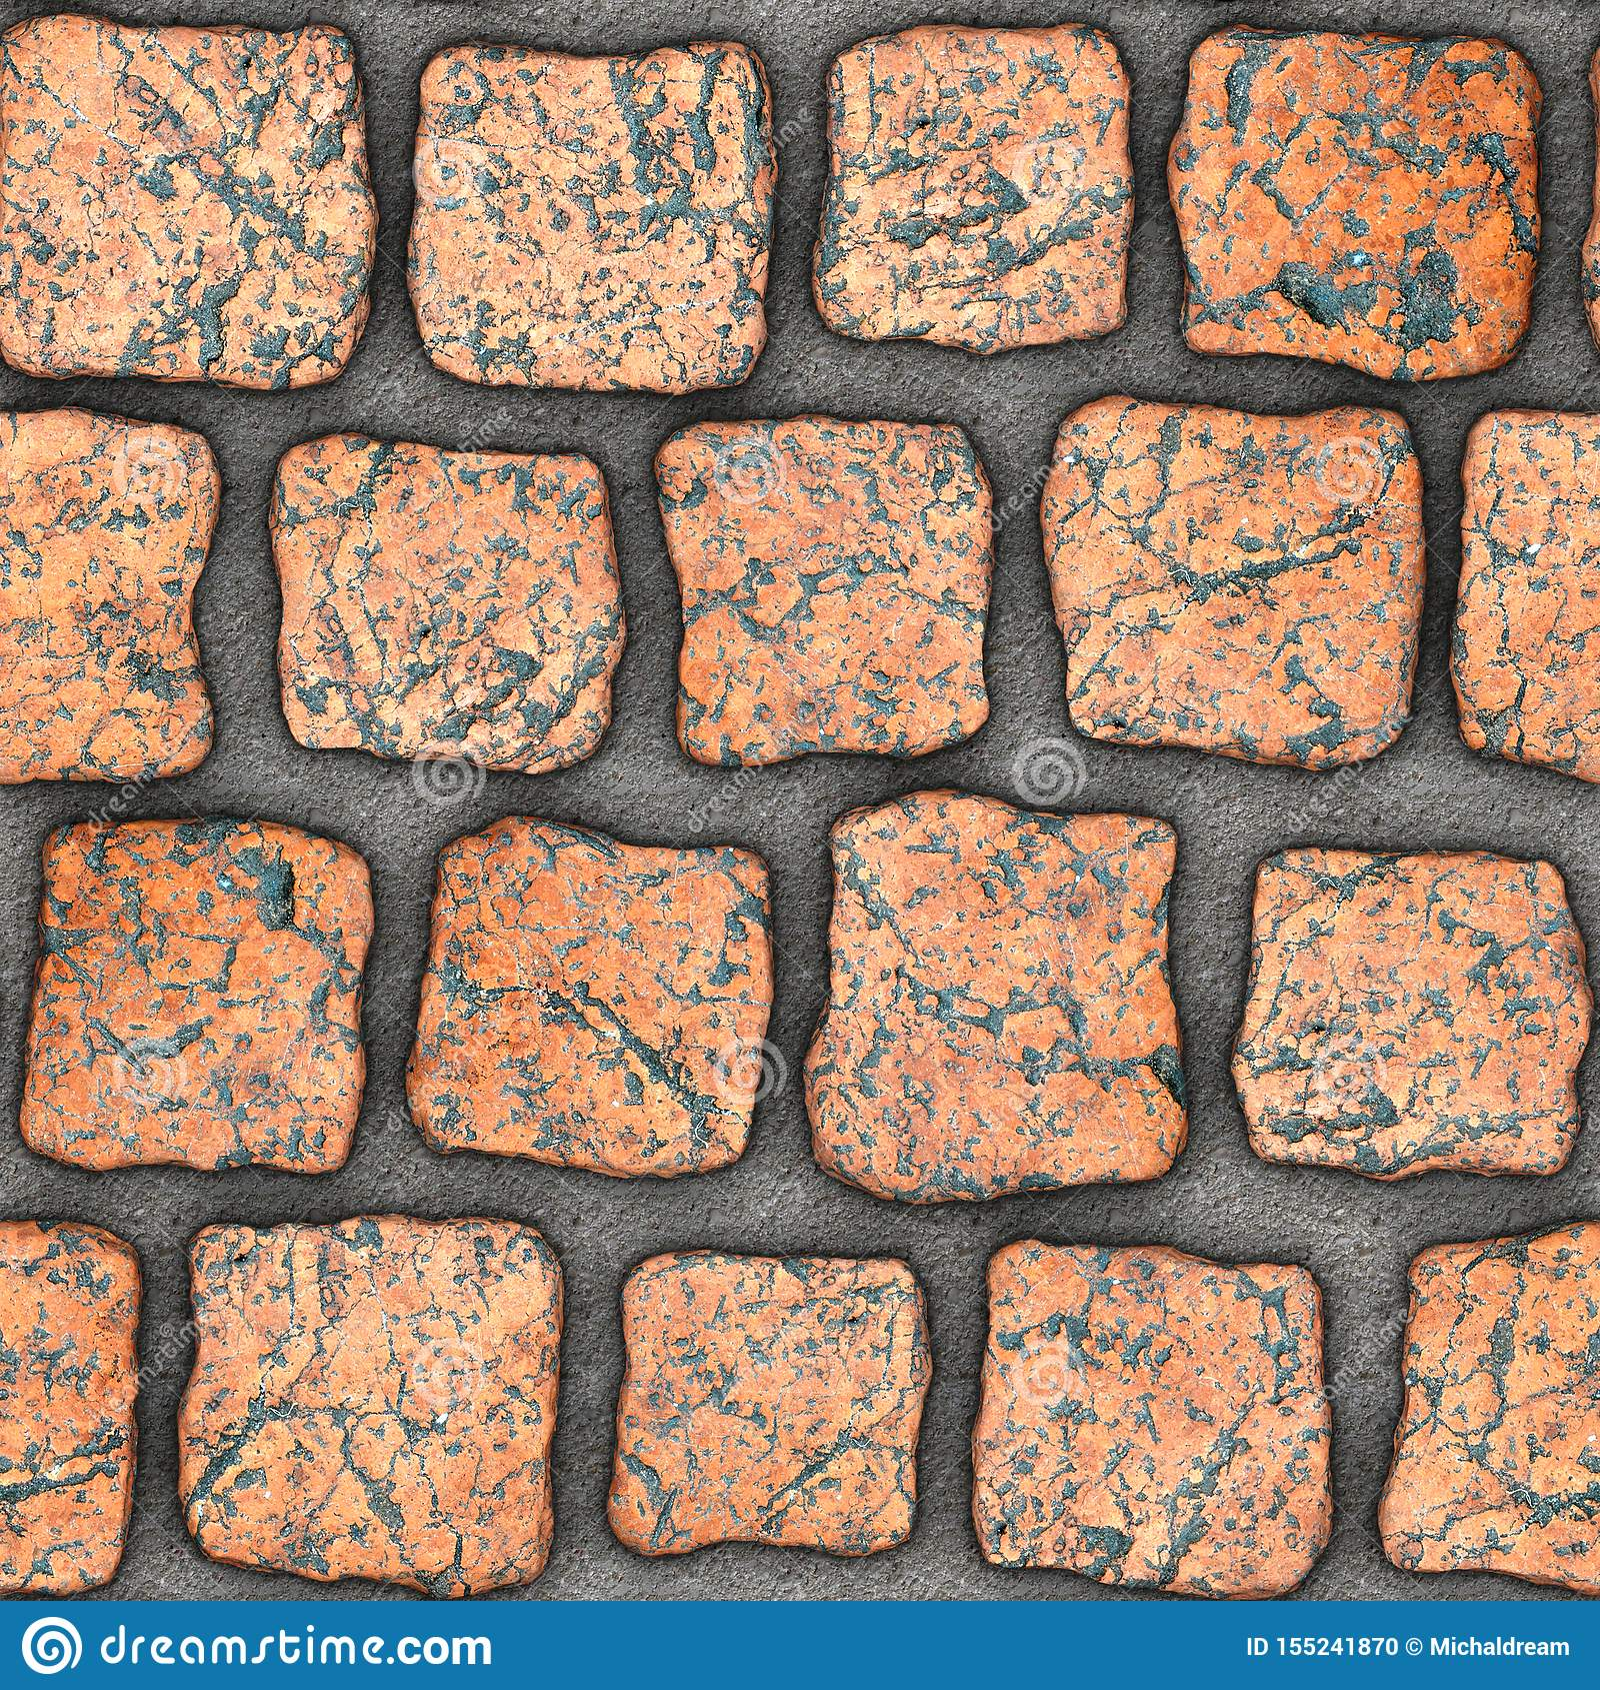 S159 Seamless texture - cobblestone pavers